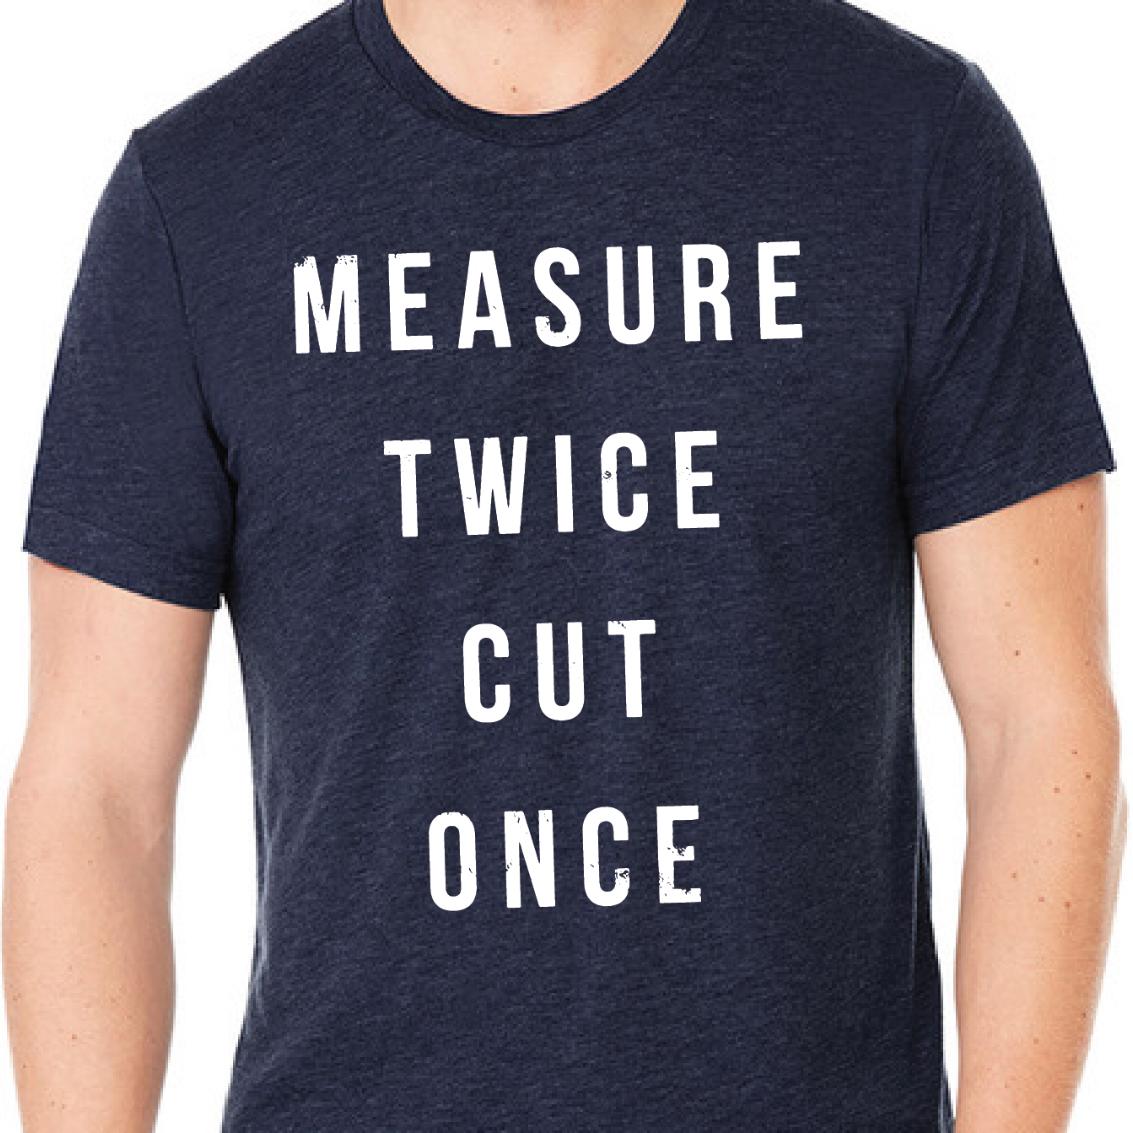 Measure Twice Cut Once Tee